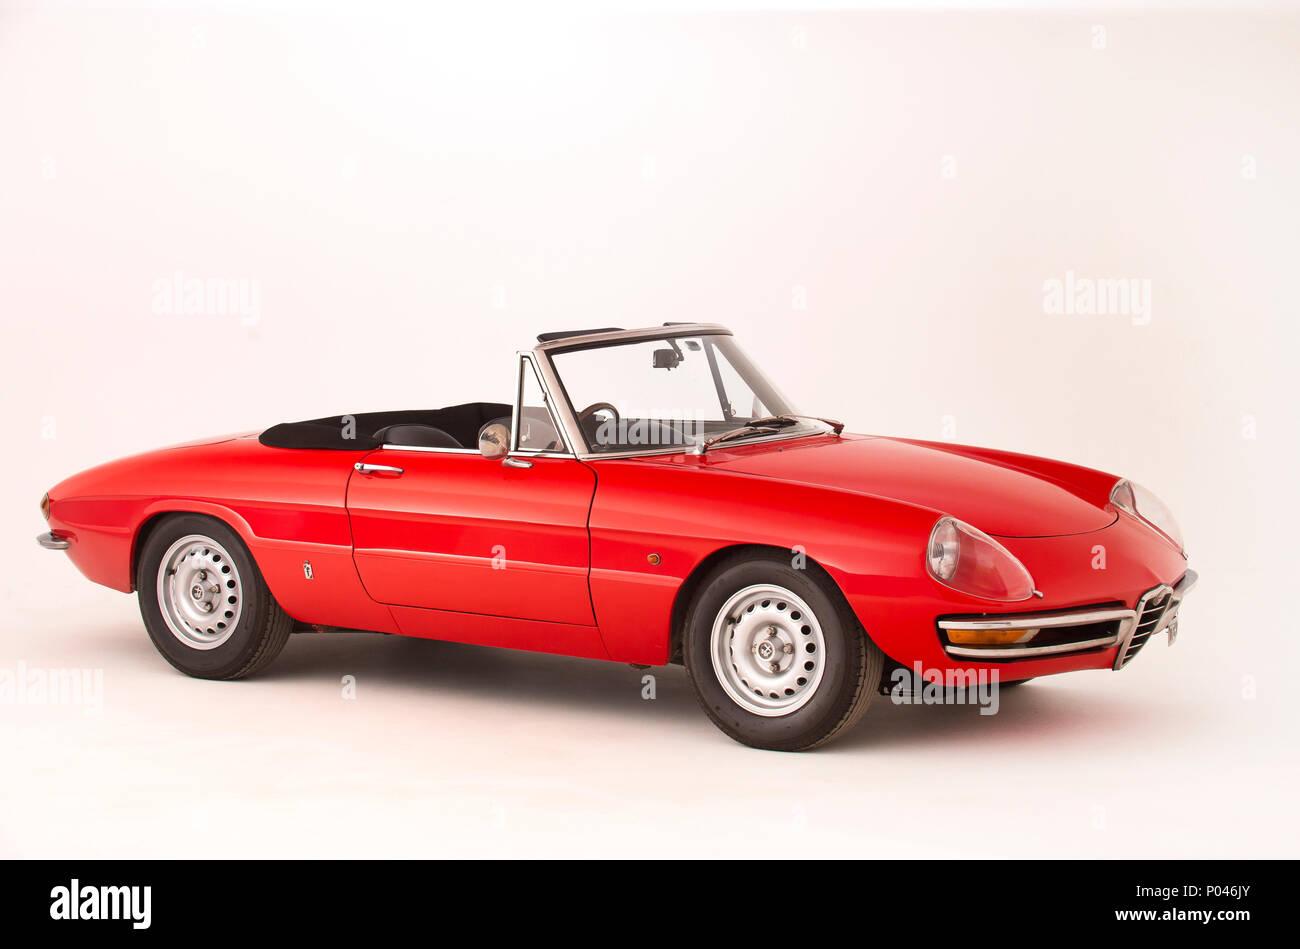 1968 Alfa Romeo 1750 Spyder - Stock Image